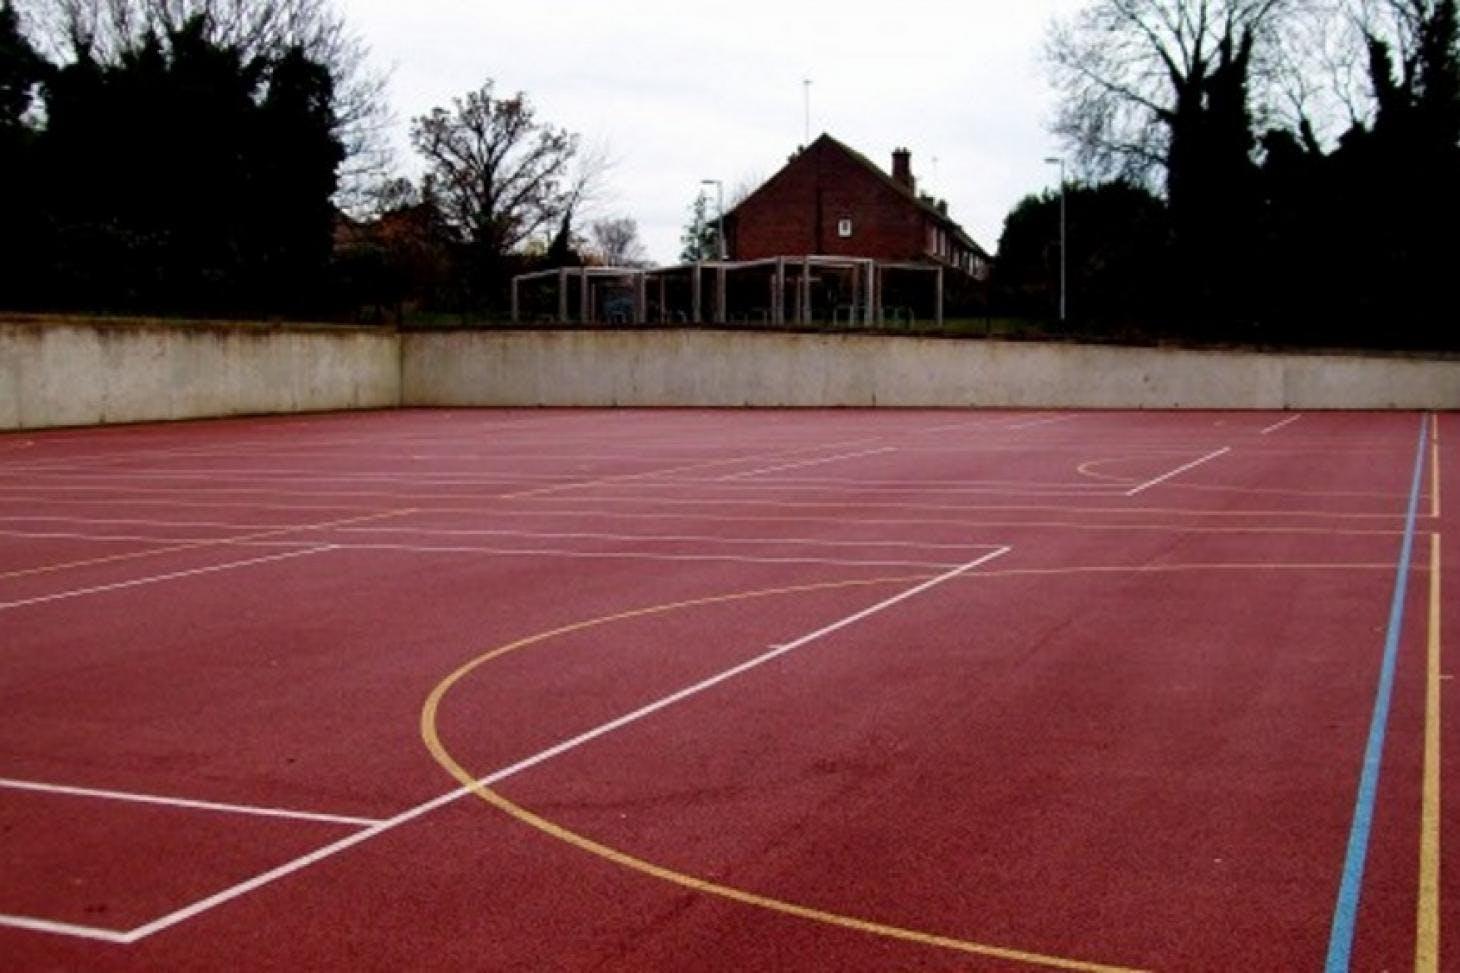 St John's Catholic Comprehensive School Outdoor | Hard (macadam) basketball court